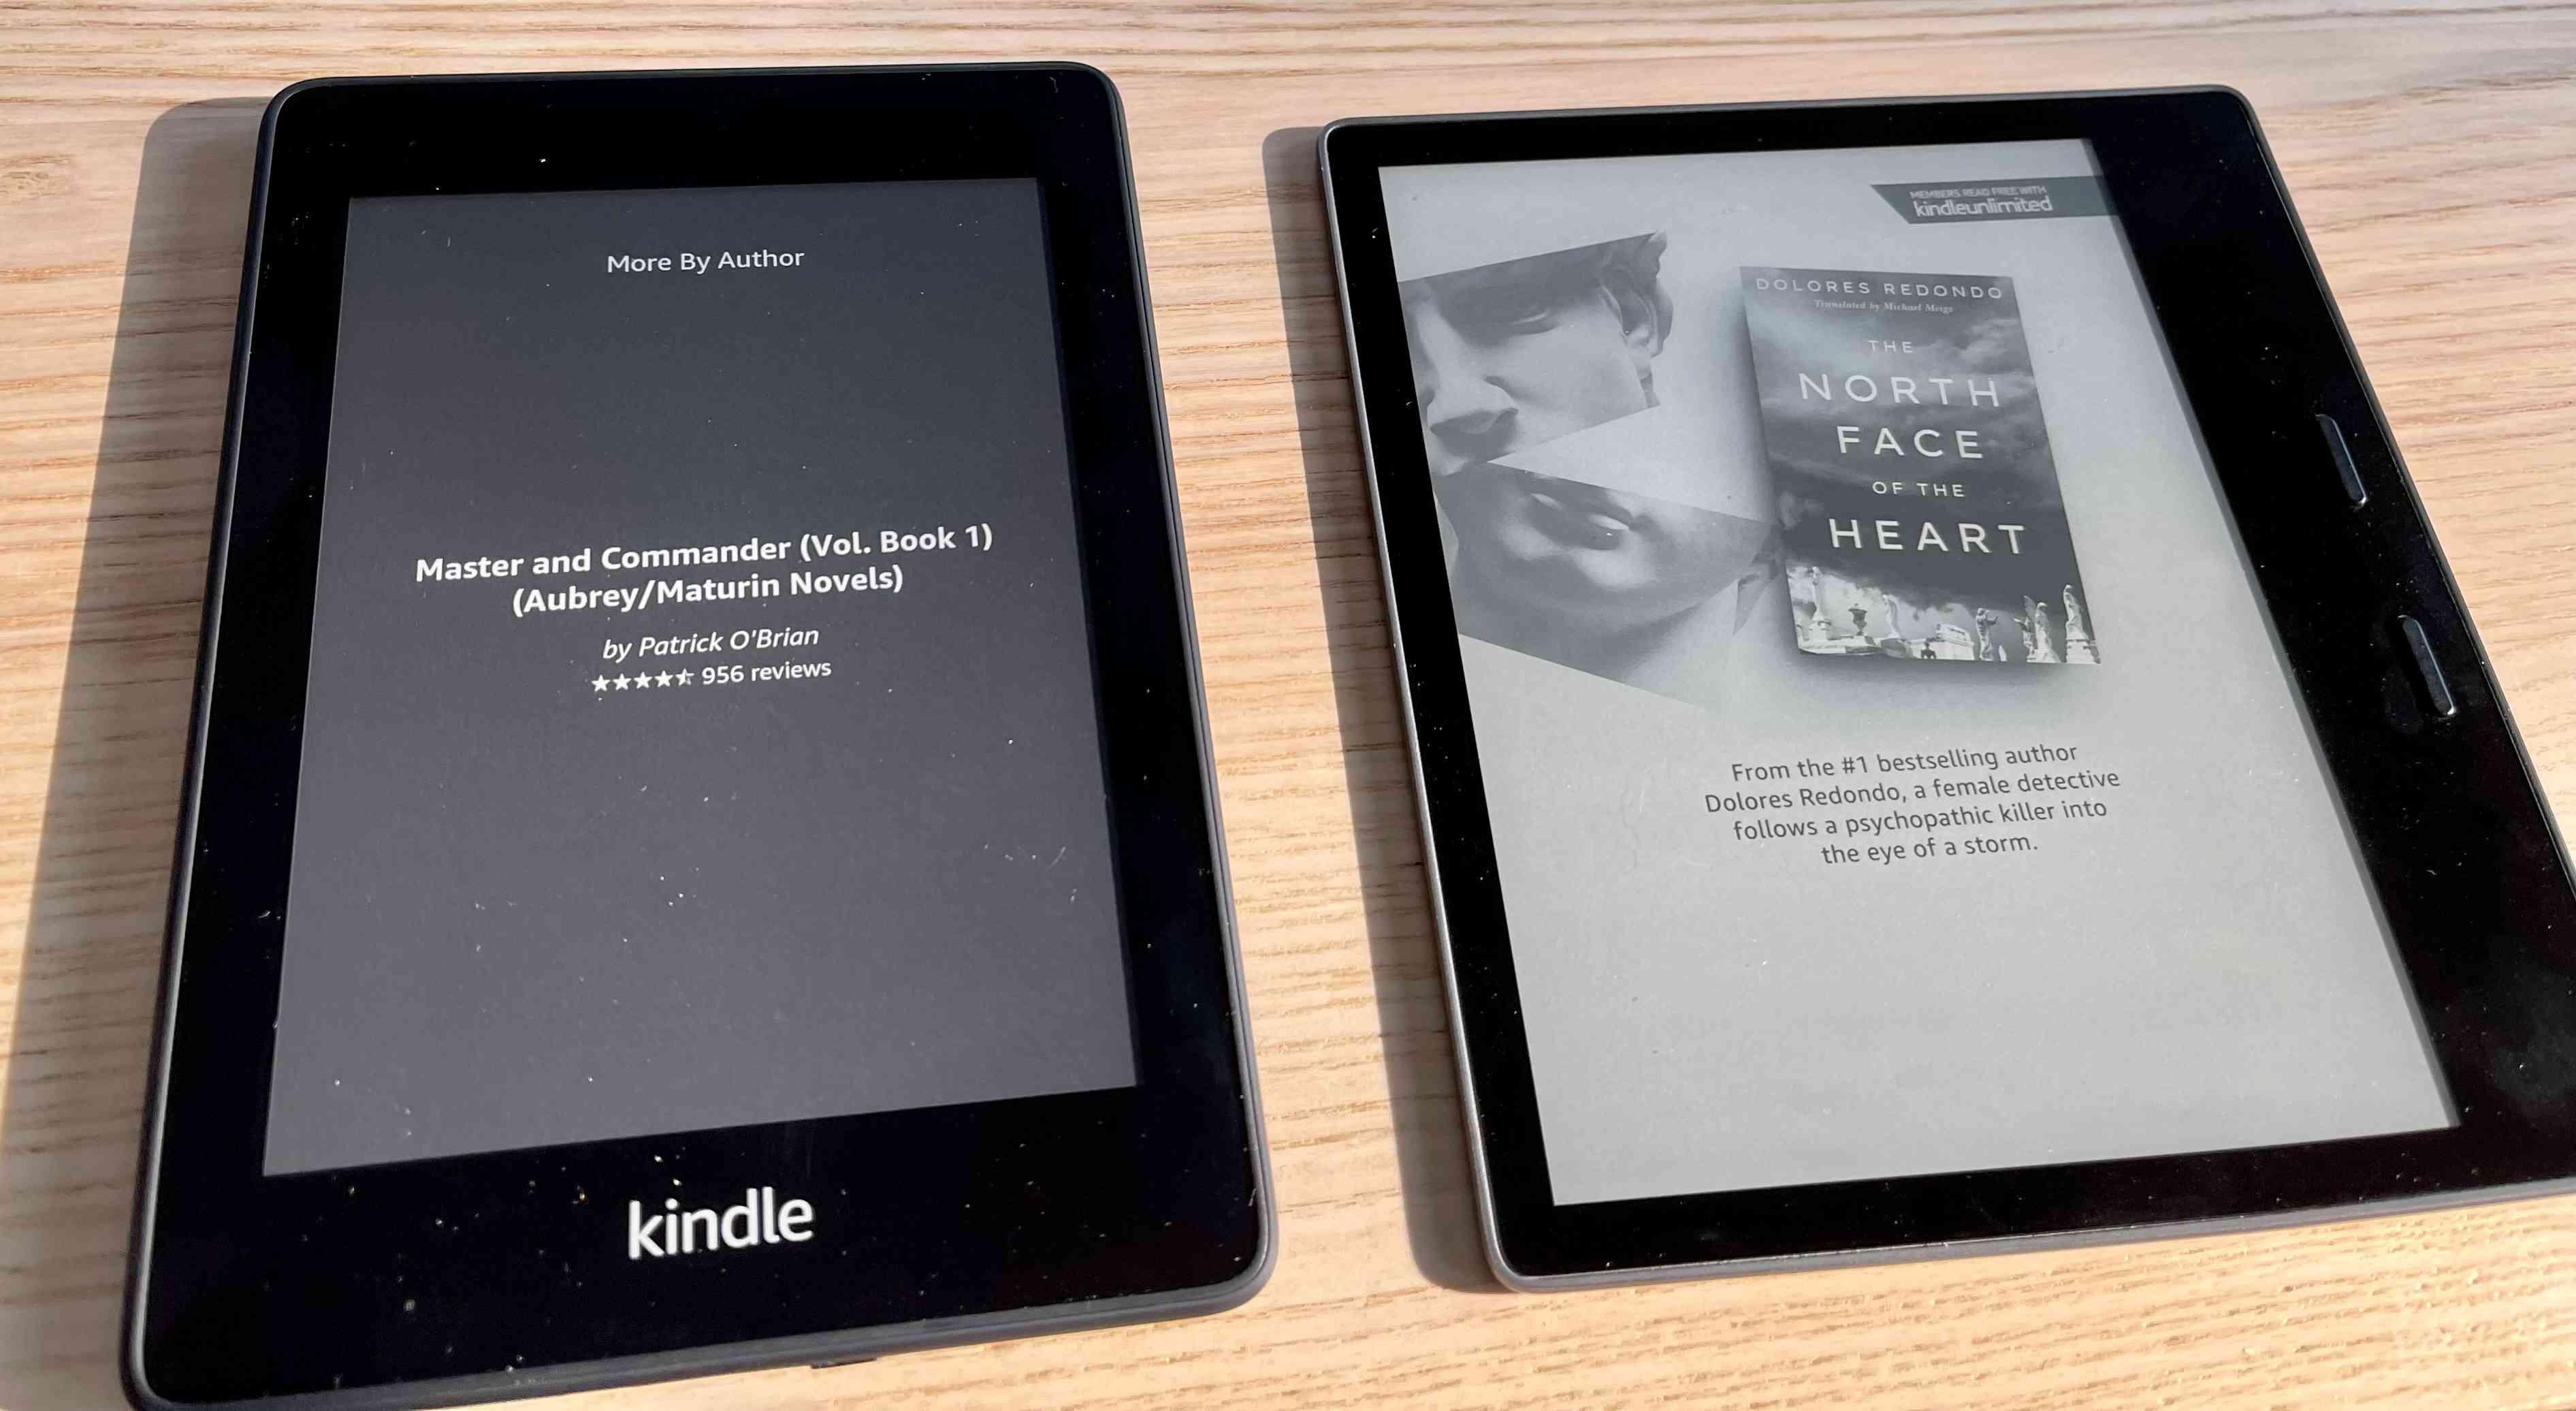 A Kindle e-reader next to a Kindle Oasis e-reader.